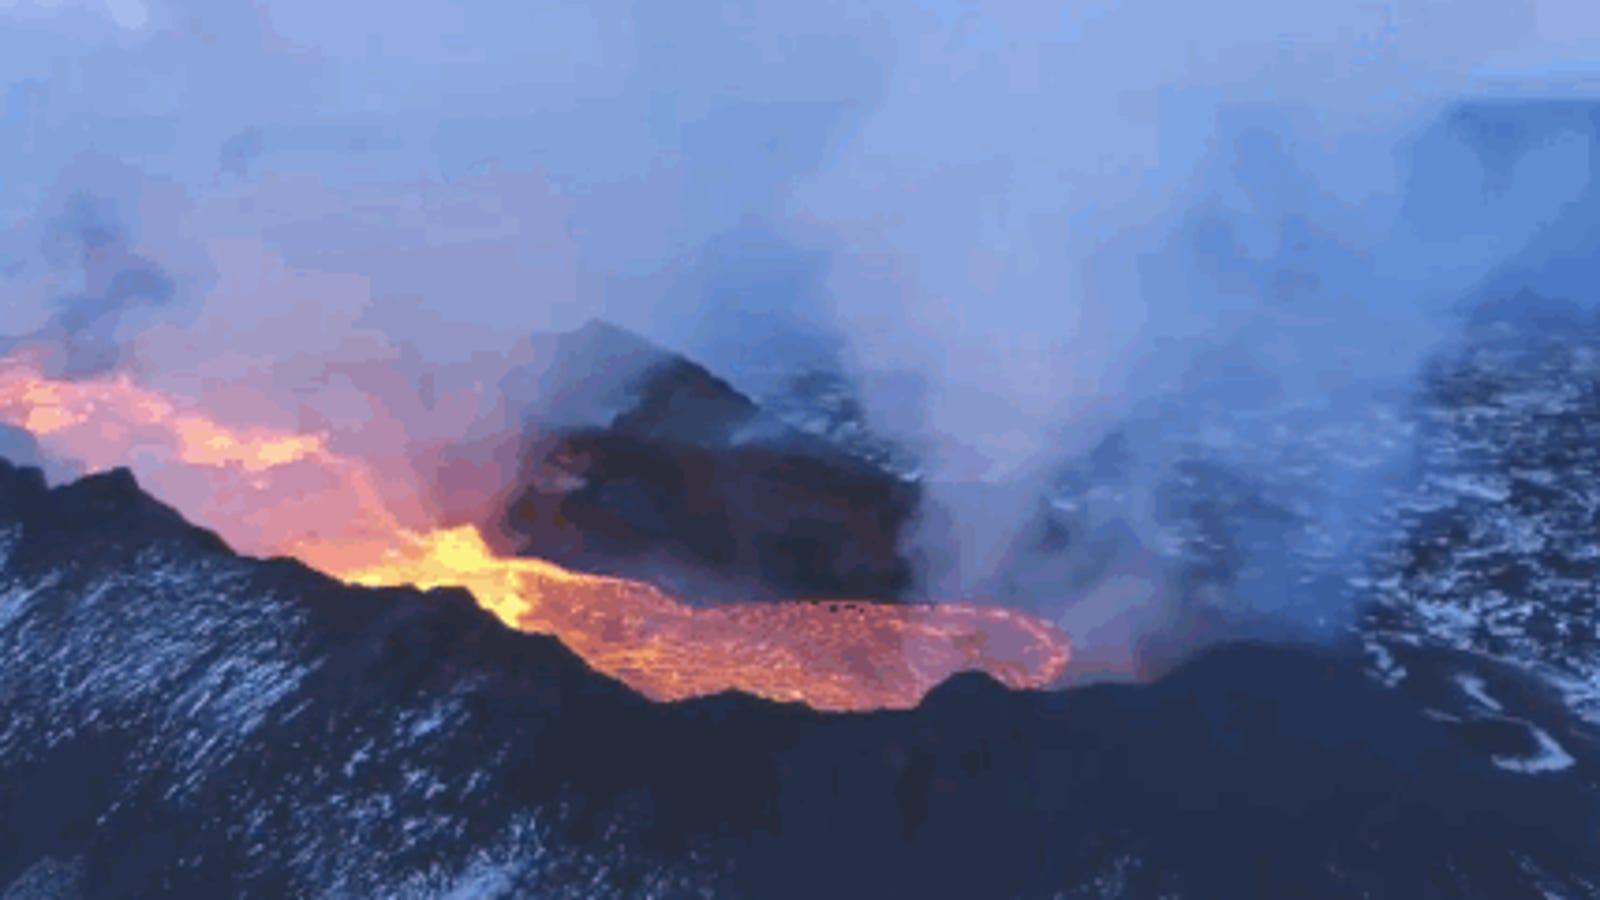 Graban en Islandia un gigantesco campo de lava más grande que Manhattan